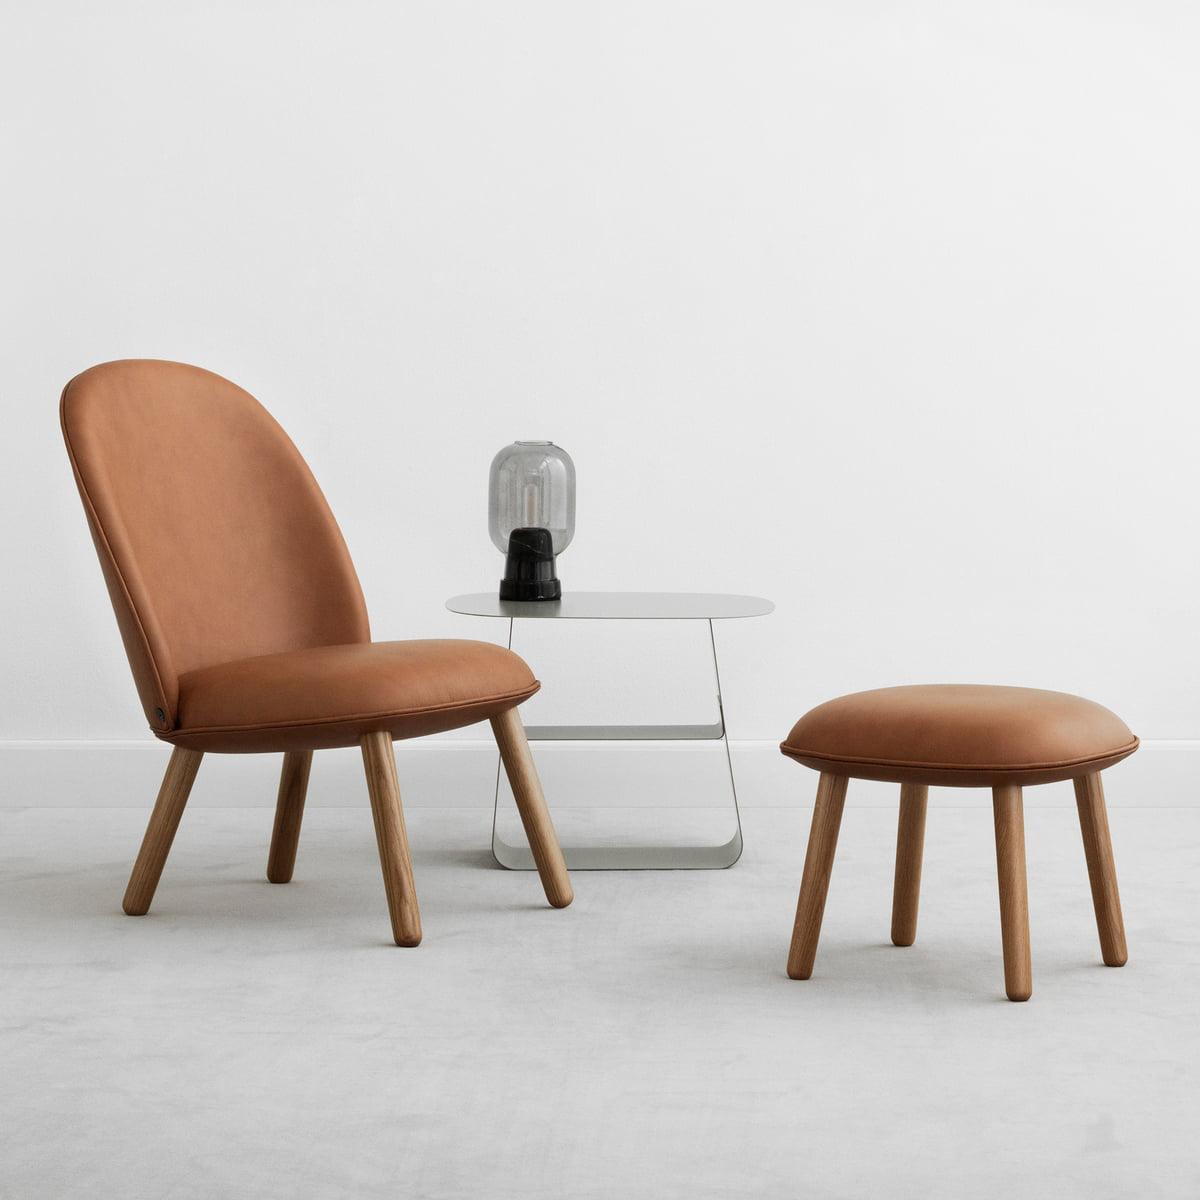 amp table lamp by normann copenhagen. Black Bedroom Furniture Sets. Home Design Ideas